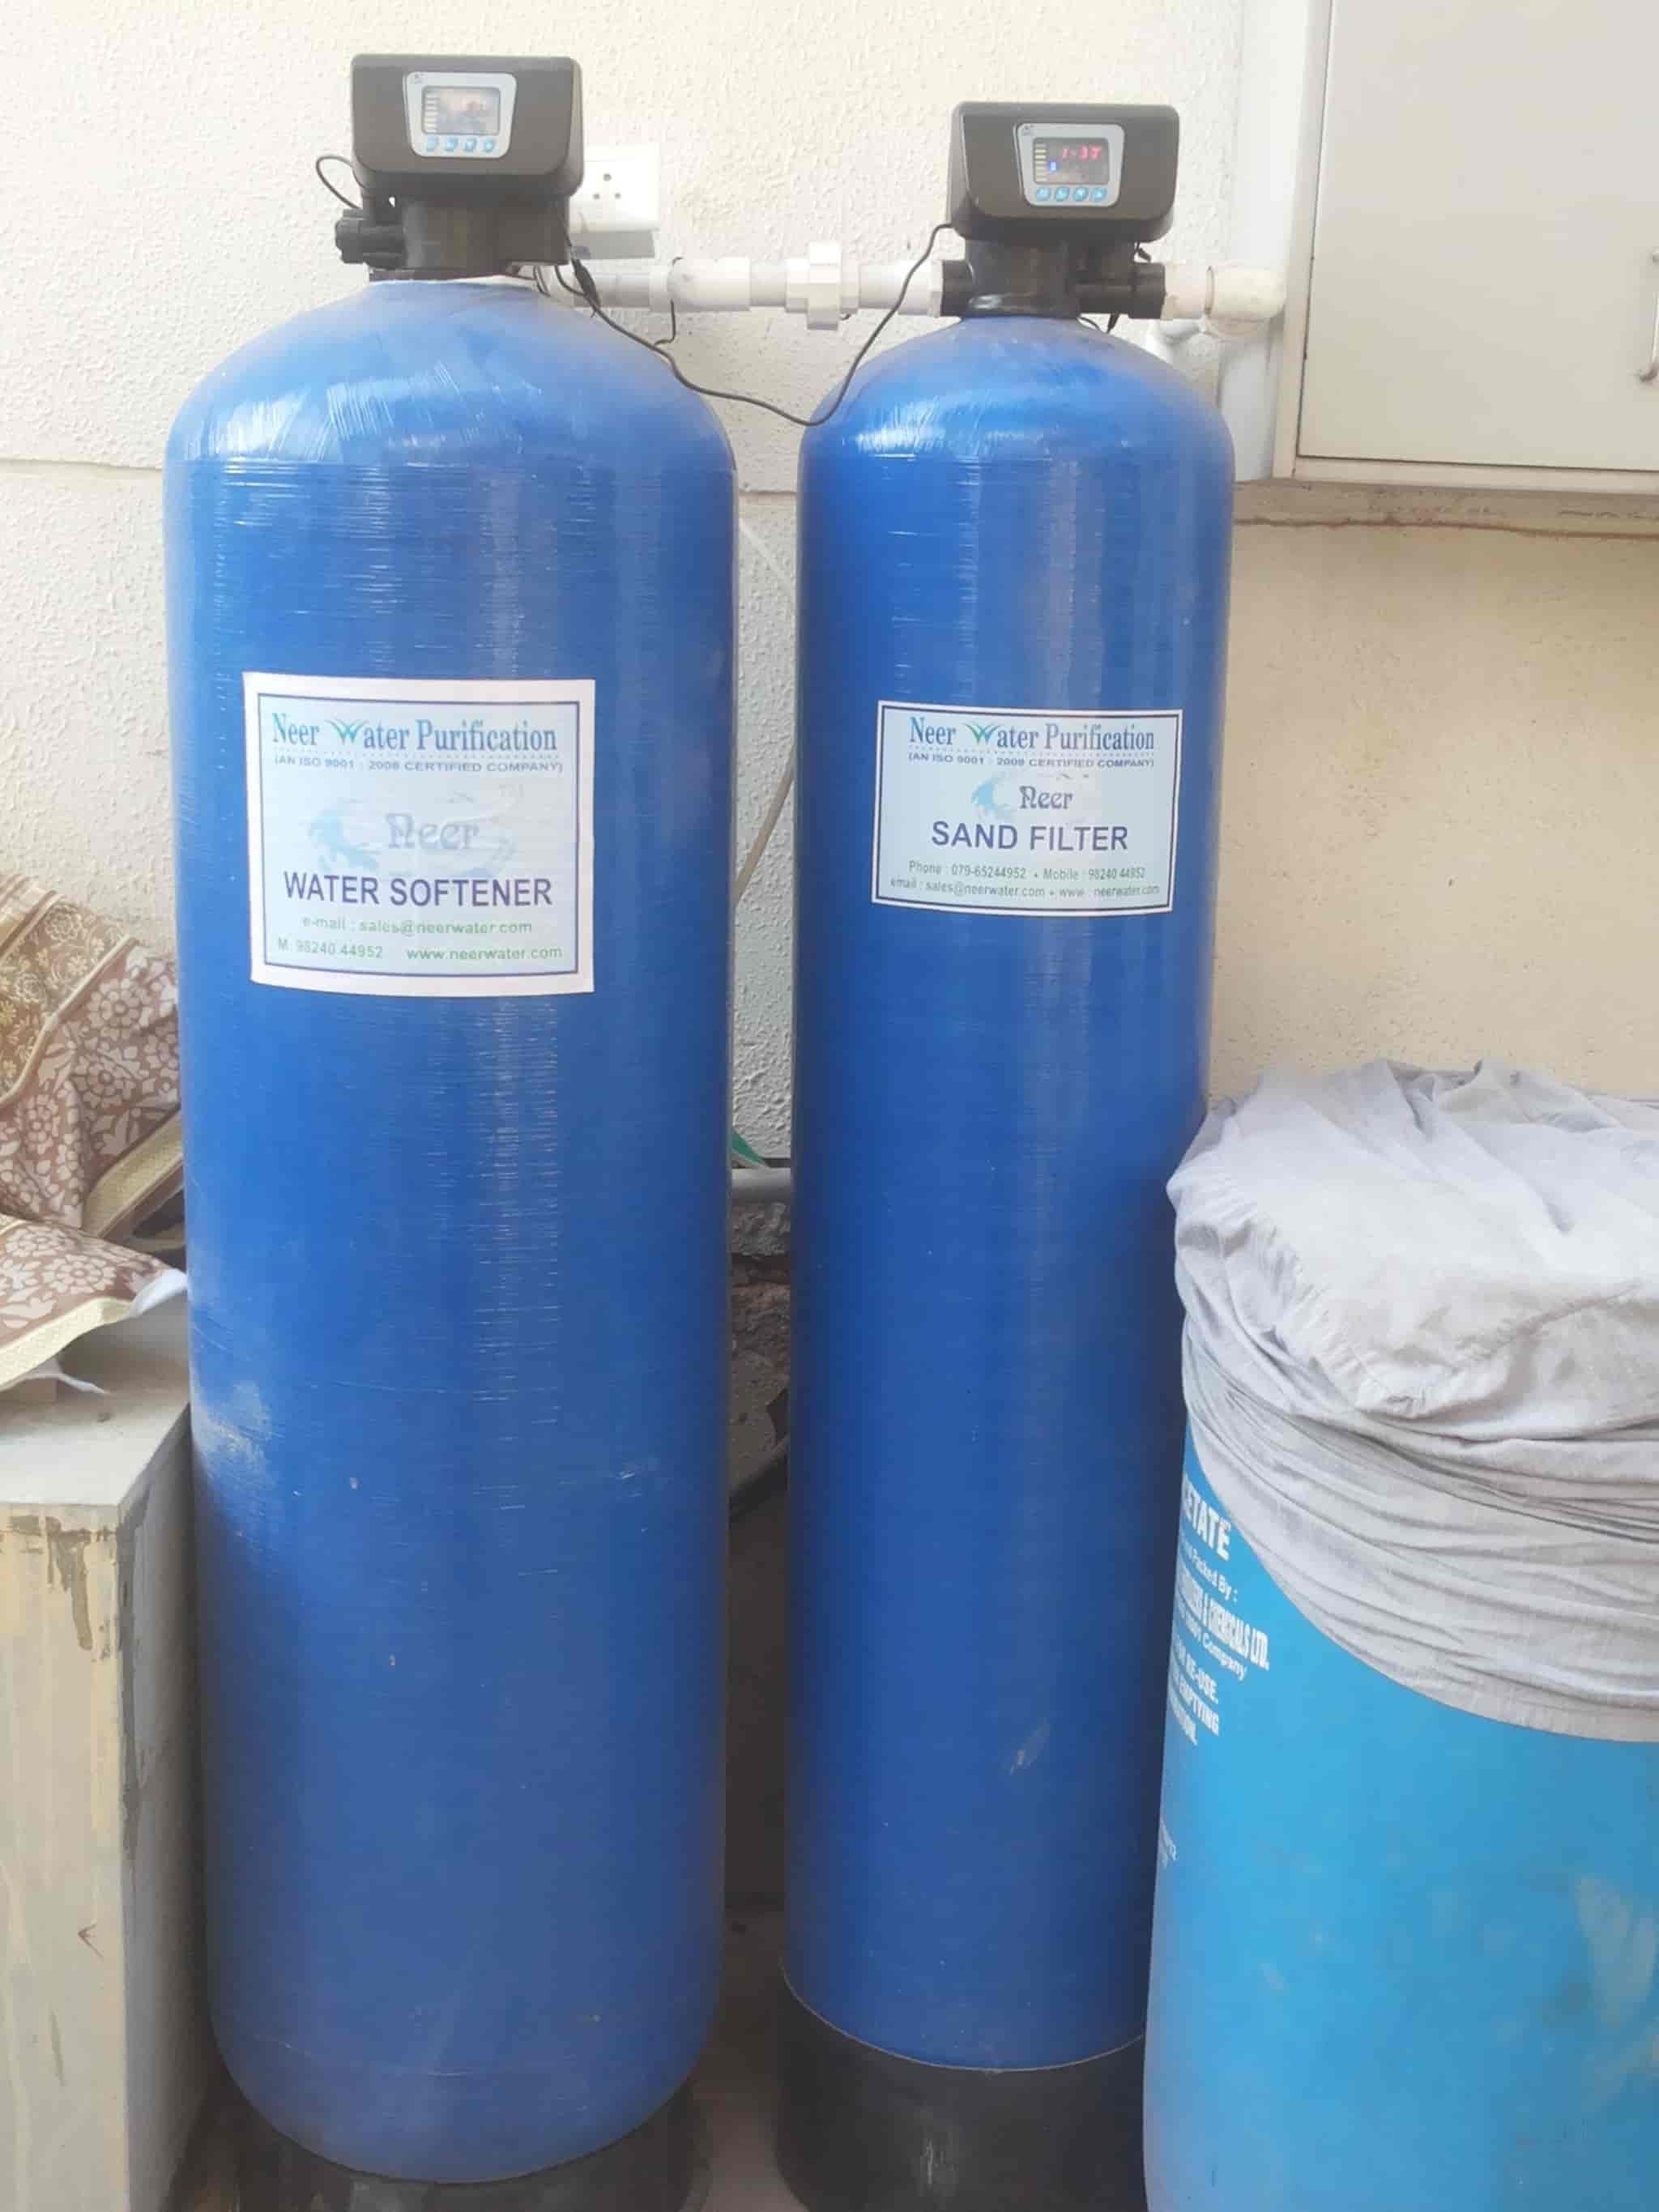 Neer Water Purification Navrangpura Water Treatment Plants For